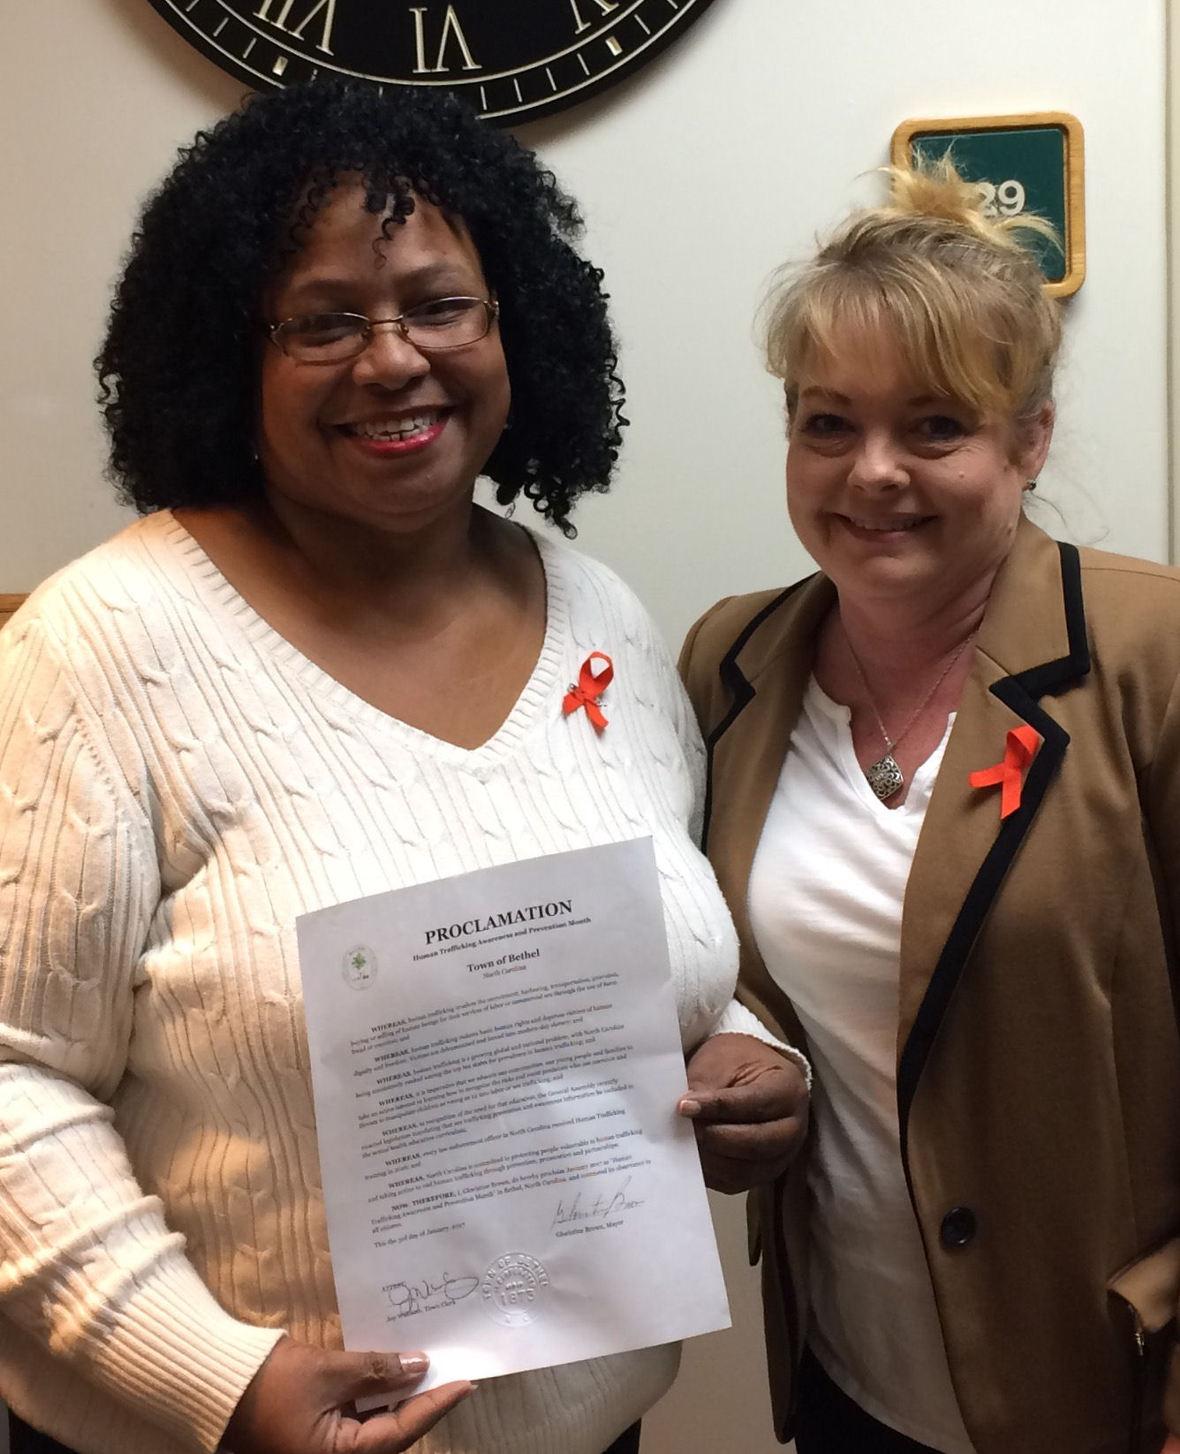 HTAM Mayor Brown Sharon with Proclamation